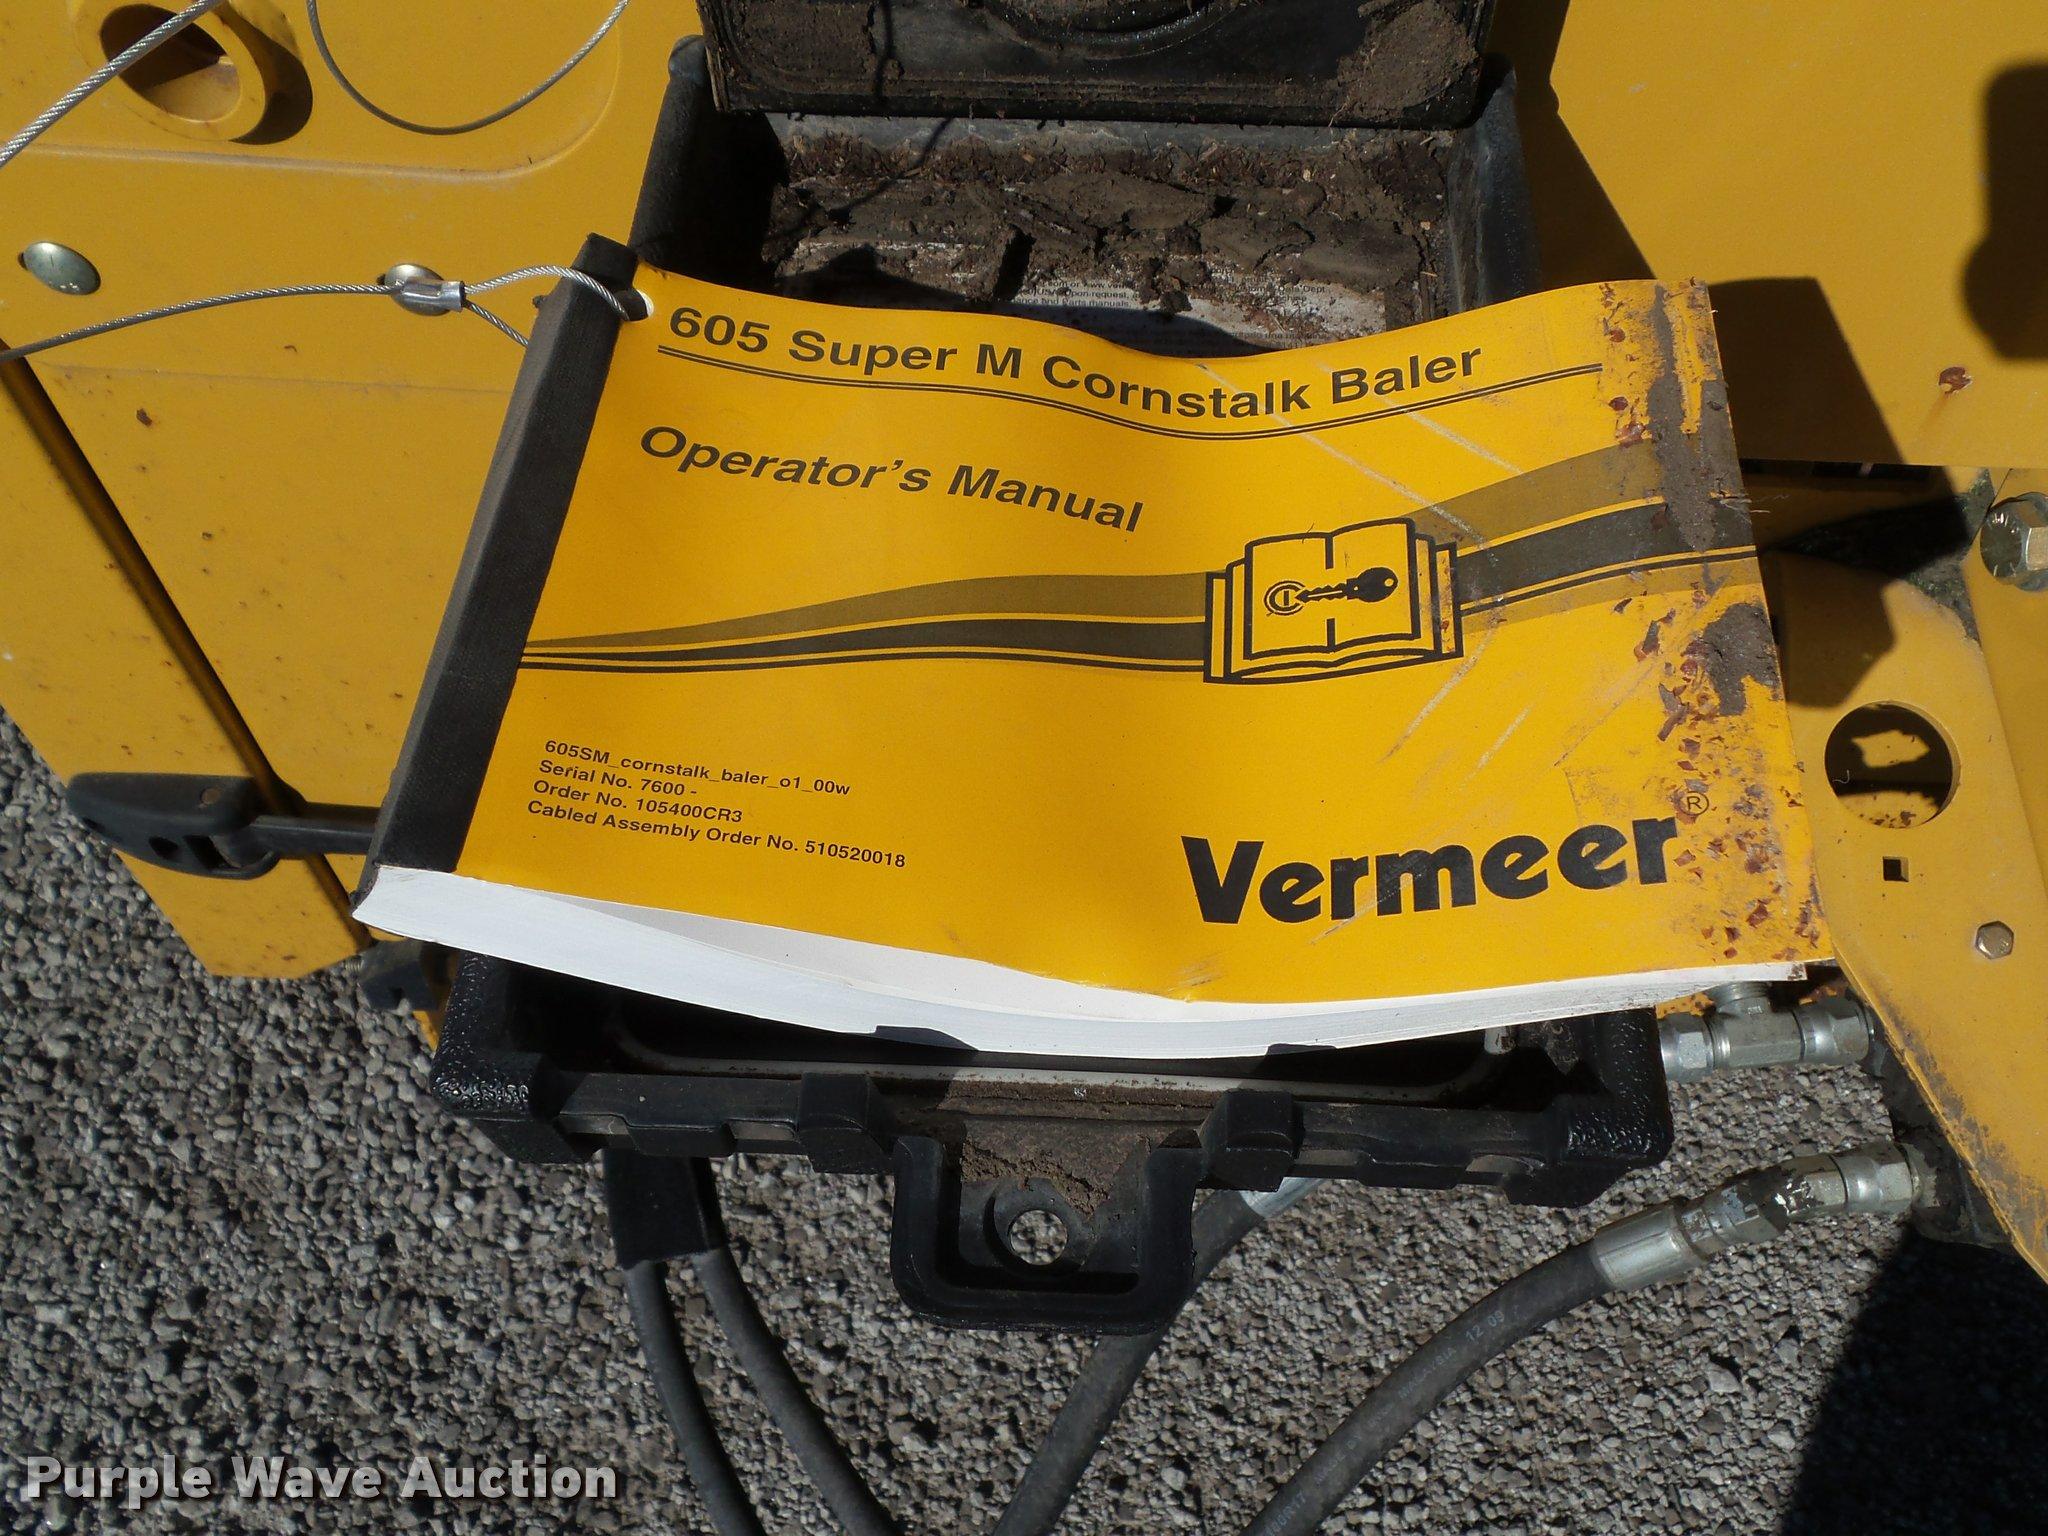 2014 Vermeer 605 Super M Cornstalk Special round baler | Ite... on